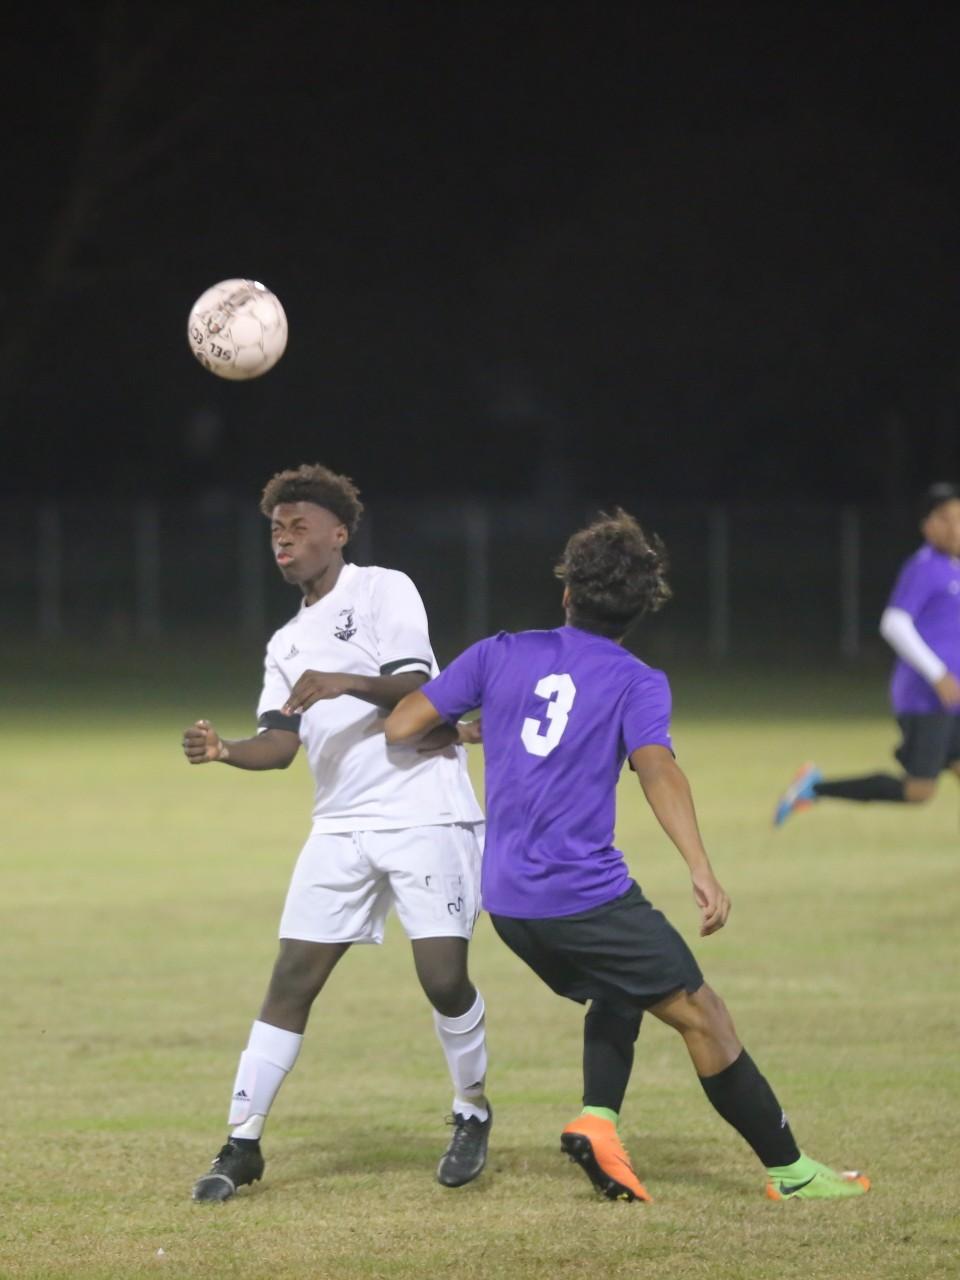 East Bladen vs West Bladen boys soccer 6